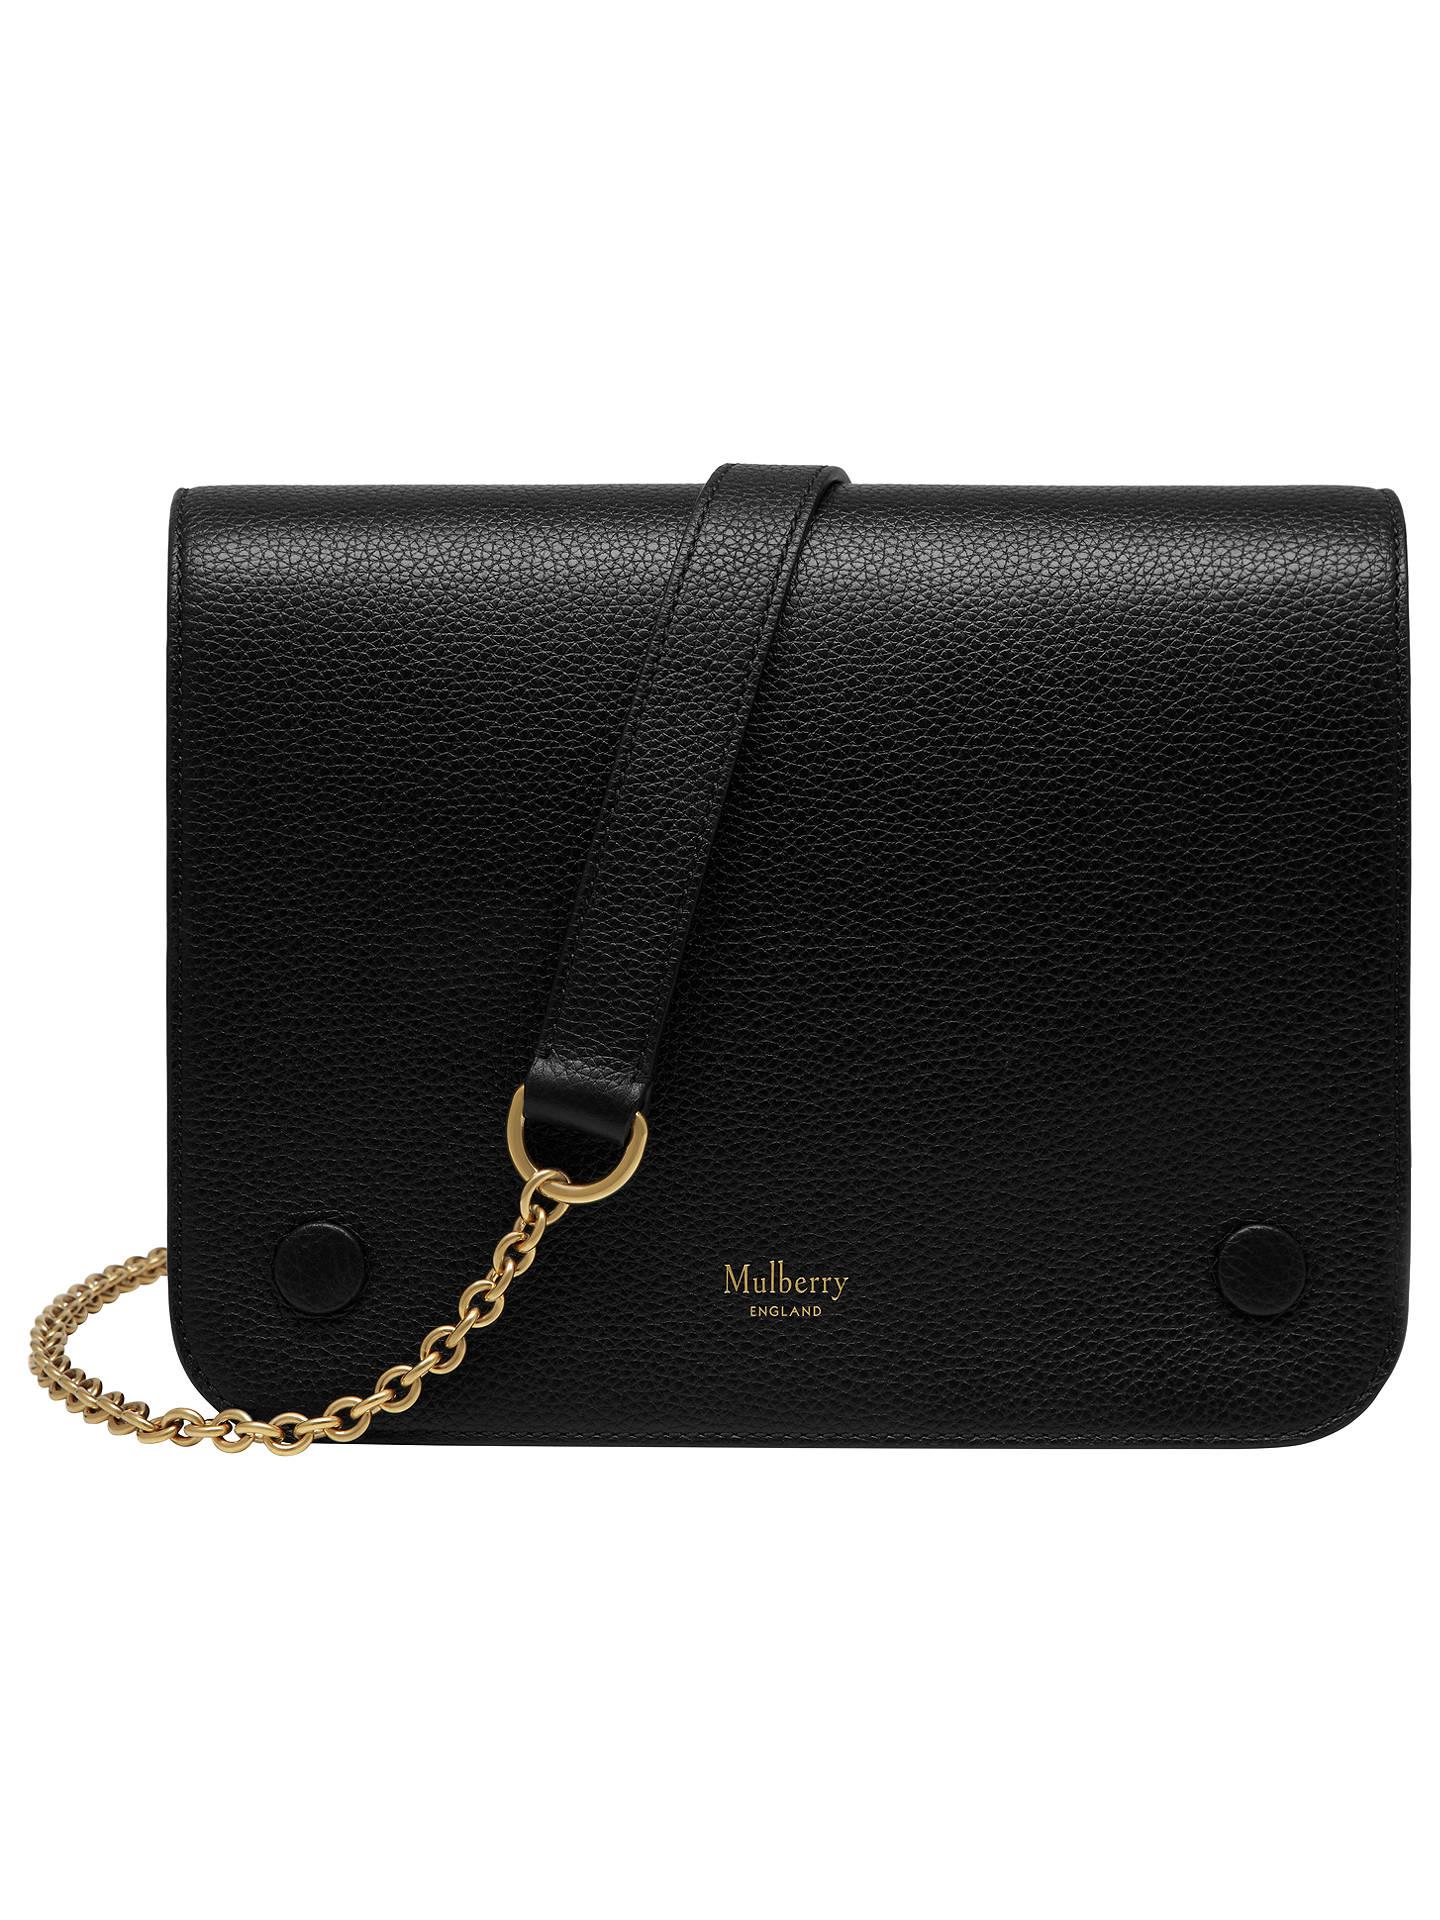 BuyMulberry Clifton Classic Grain Leather Across Body Bag 76c17e25c5a2c